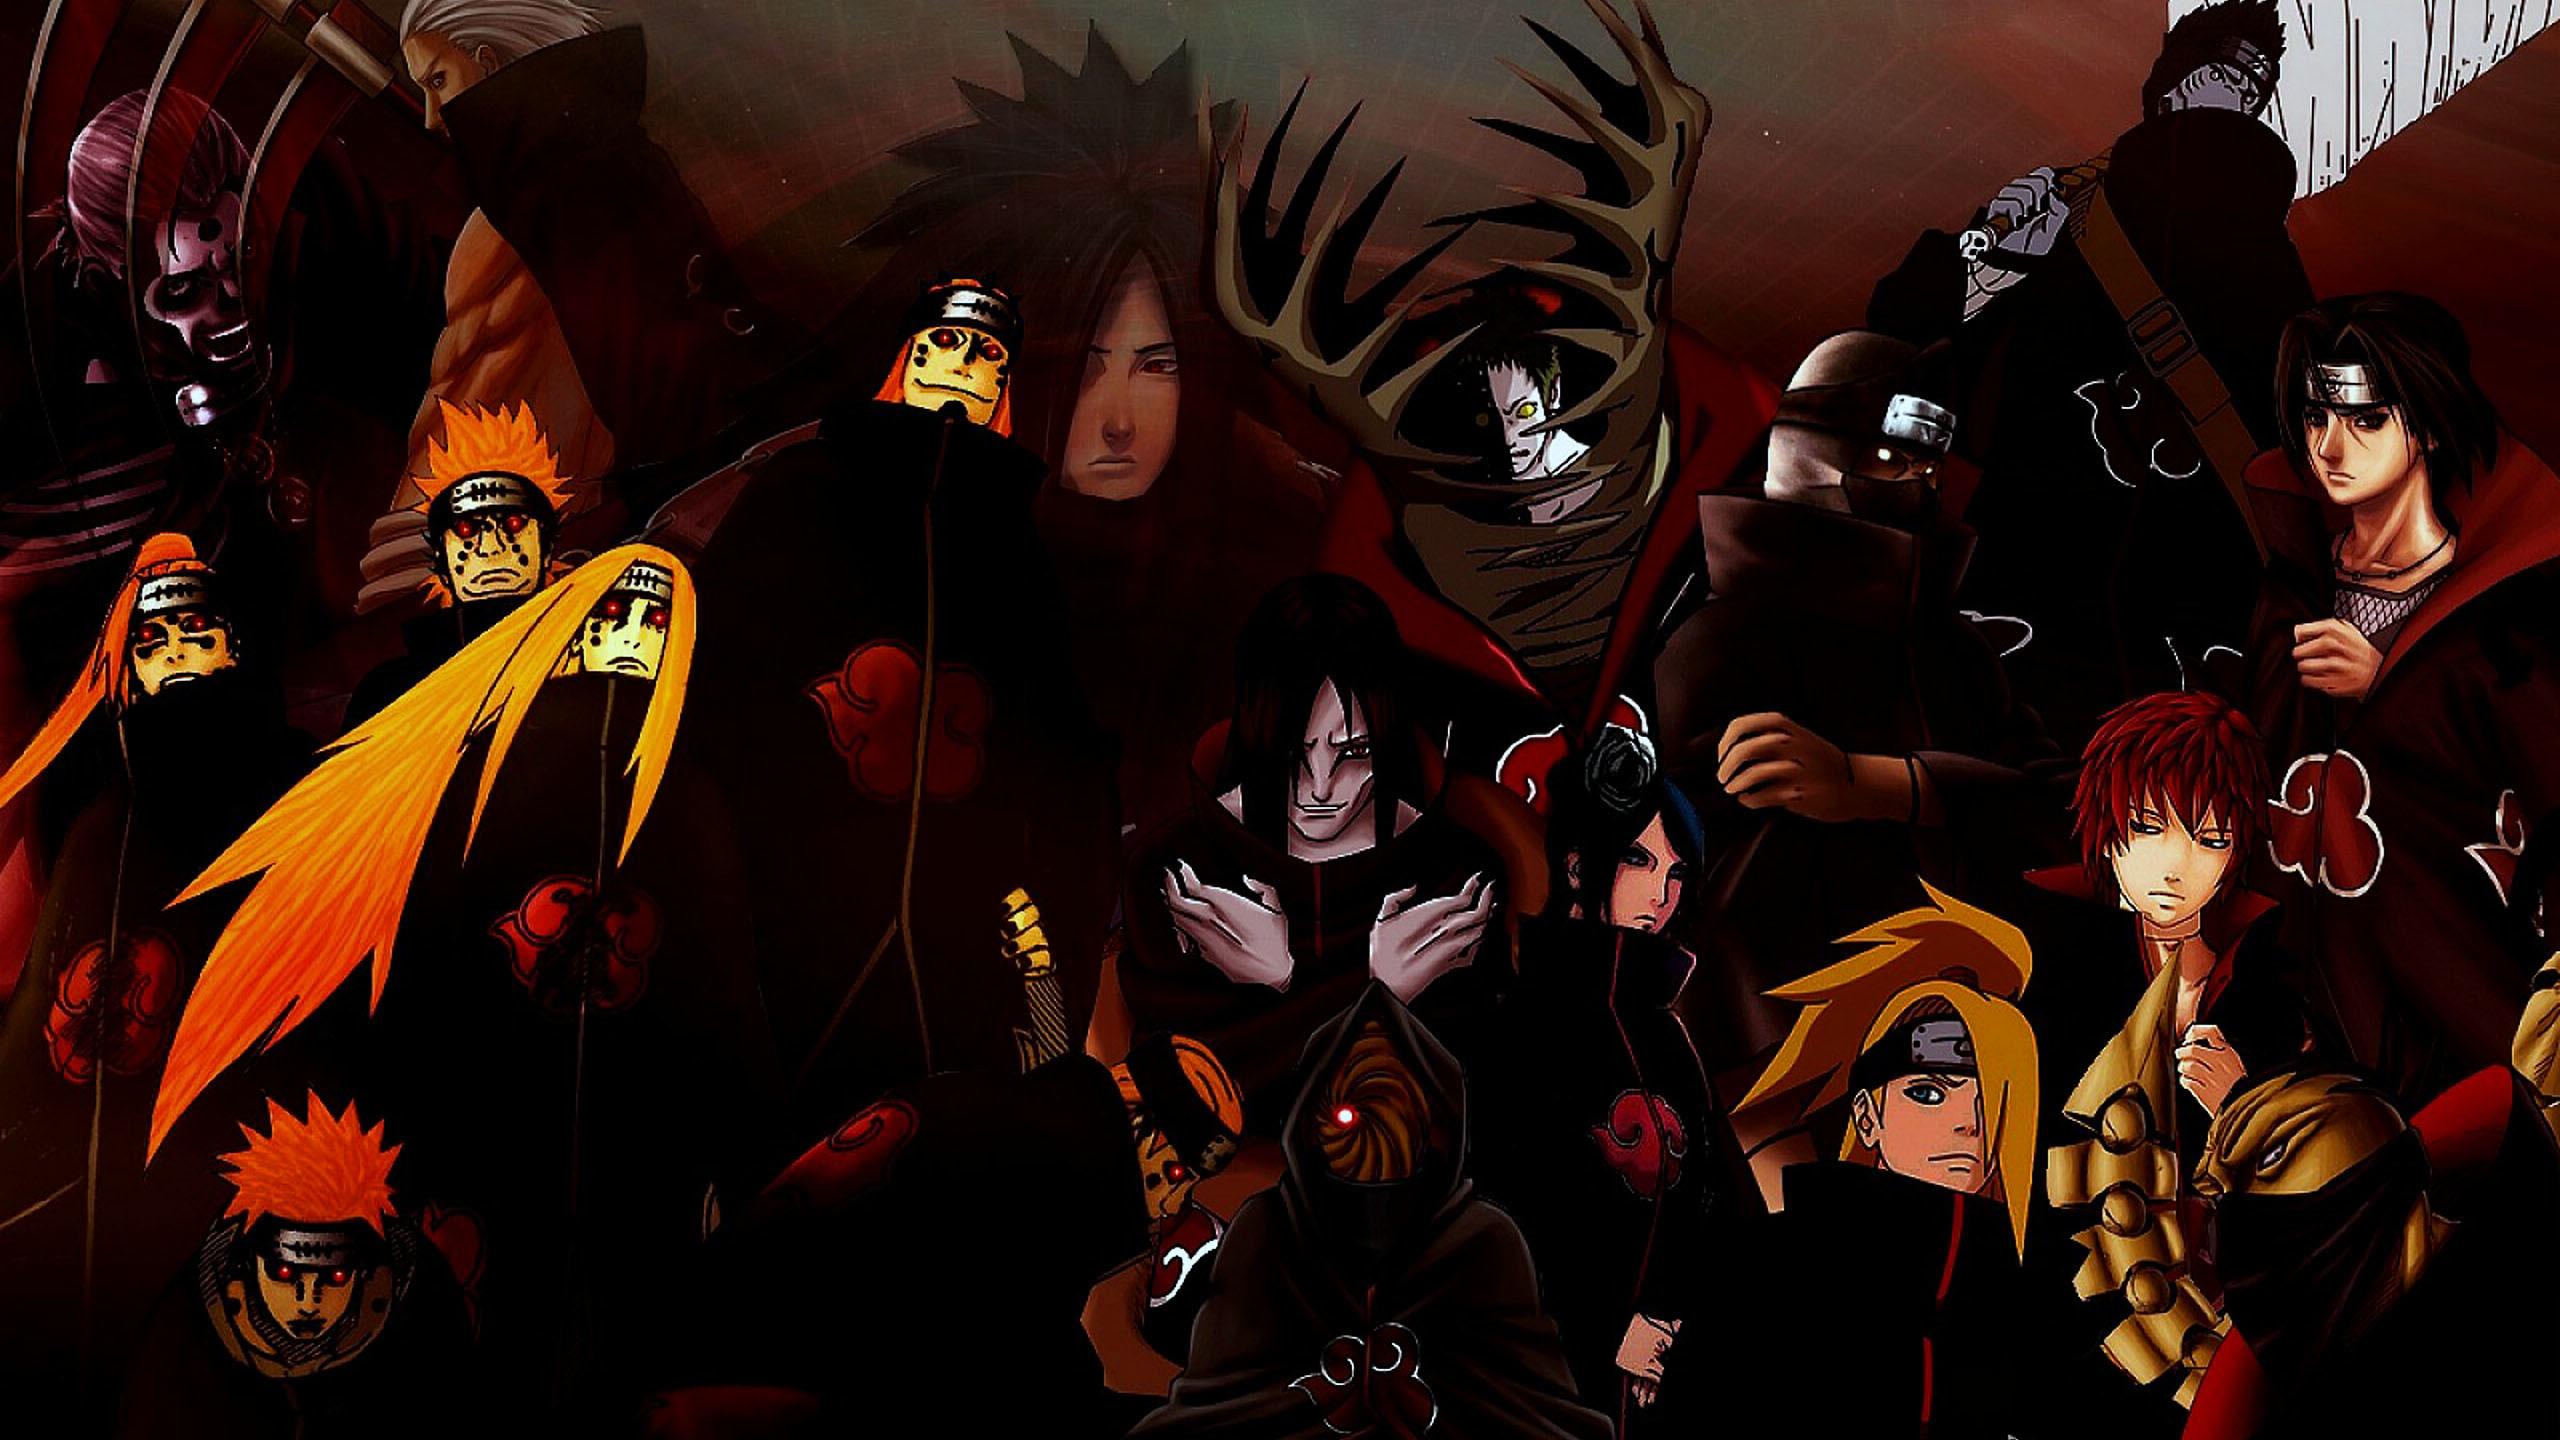 Download 500+ Wallpaper Naruto Akatsuki Hd HD Paling Keren